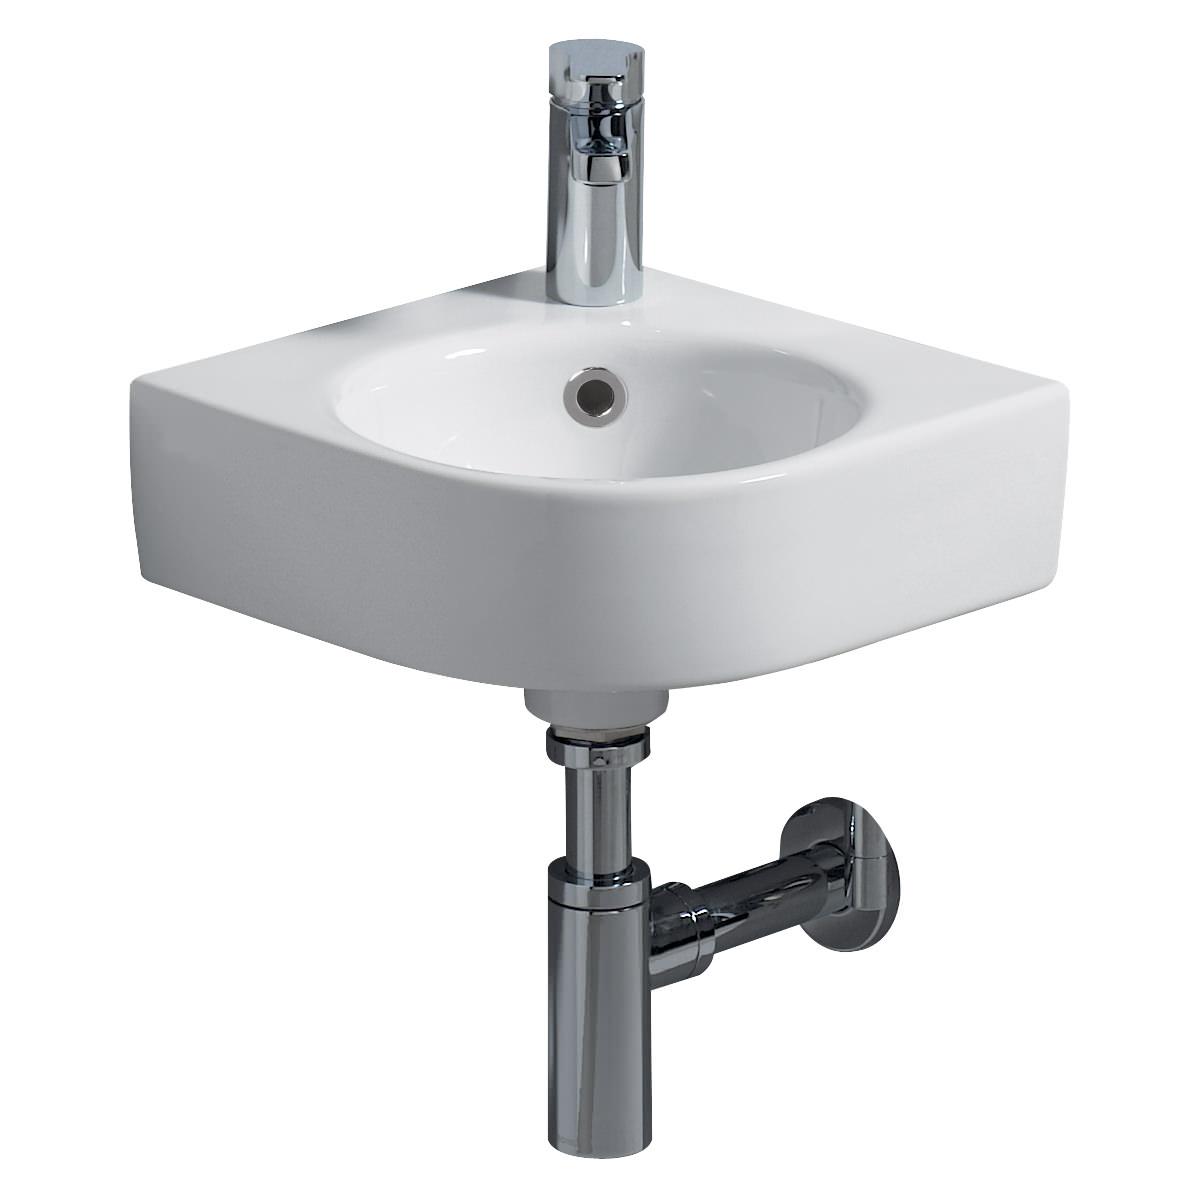 Twyford E200 1 Tap Hole 320 X 320mm Corner Handrinse Basin